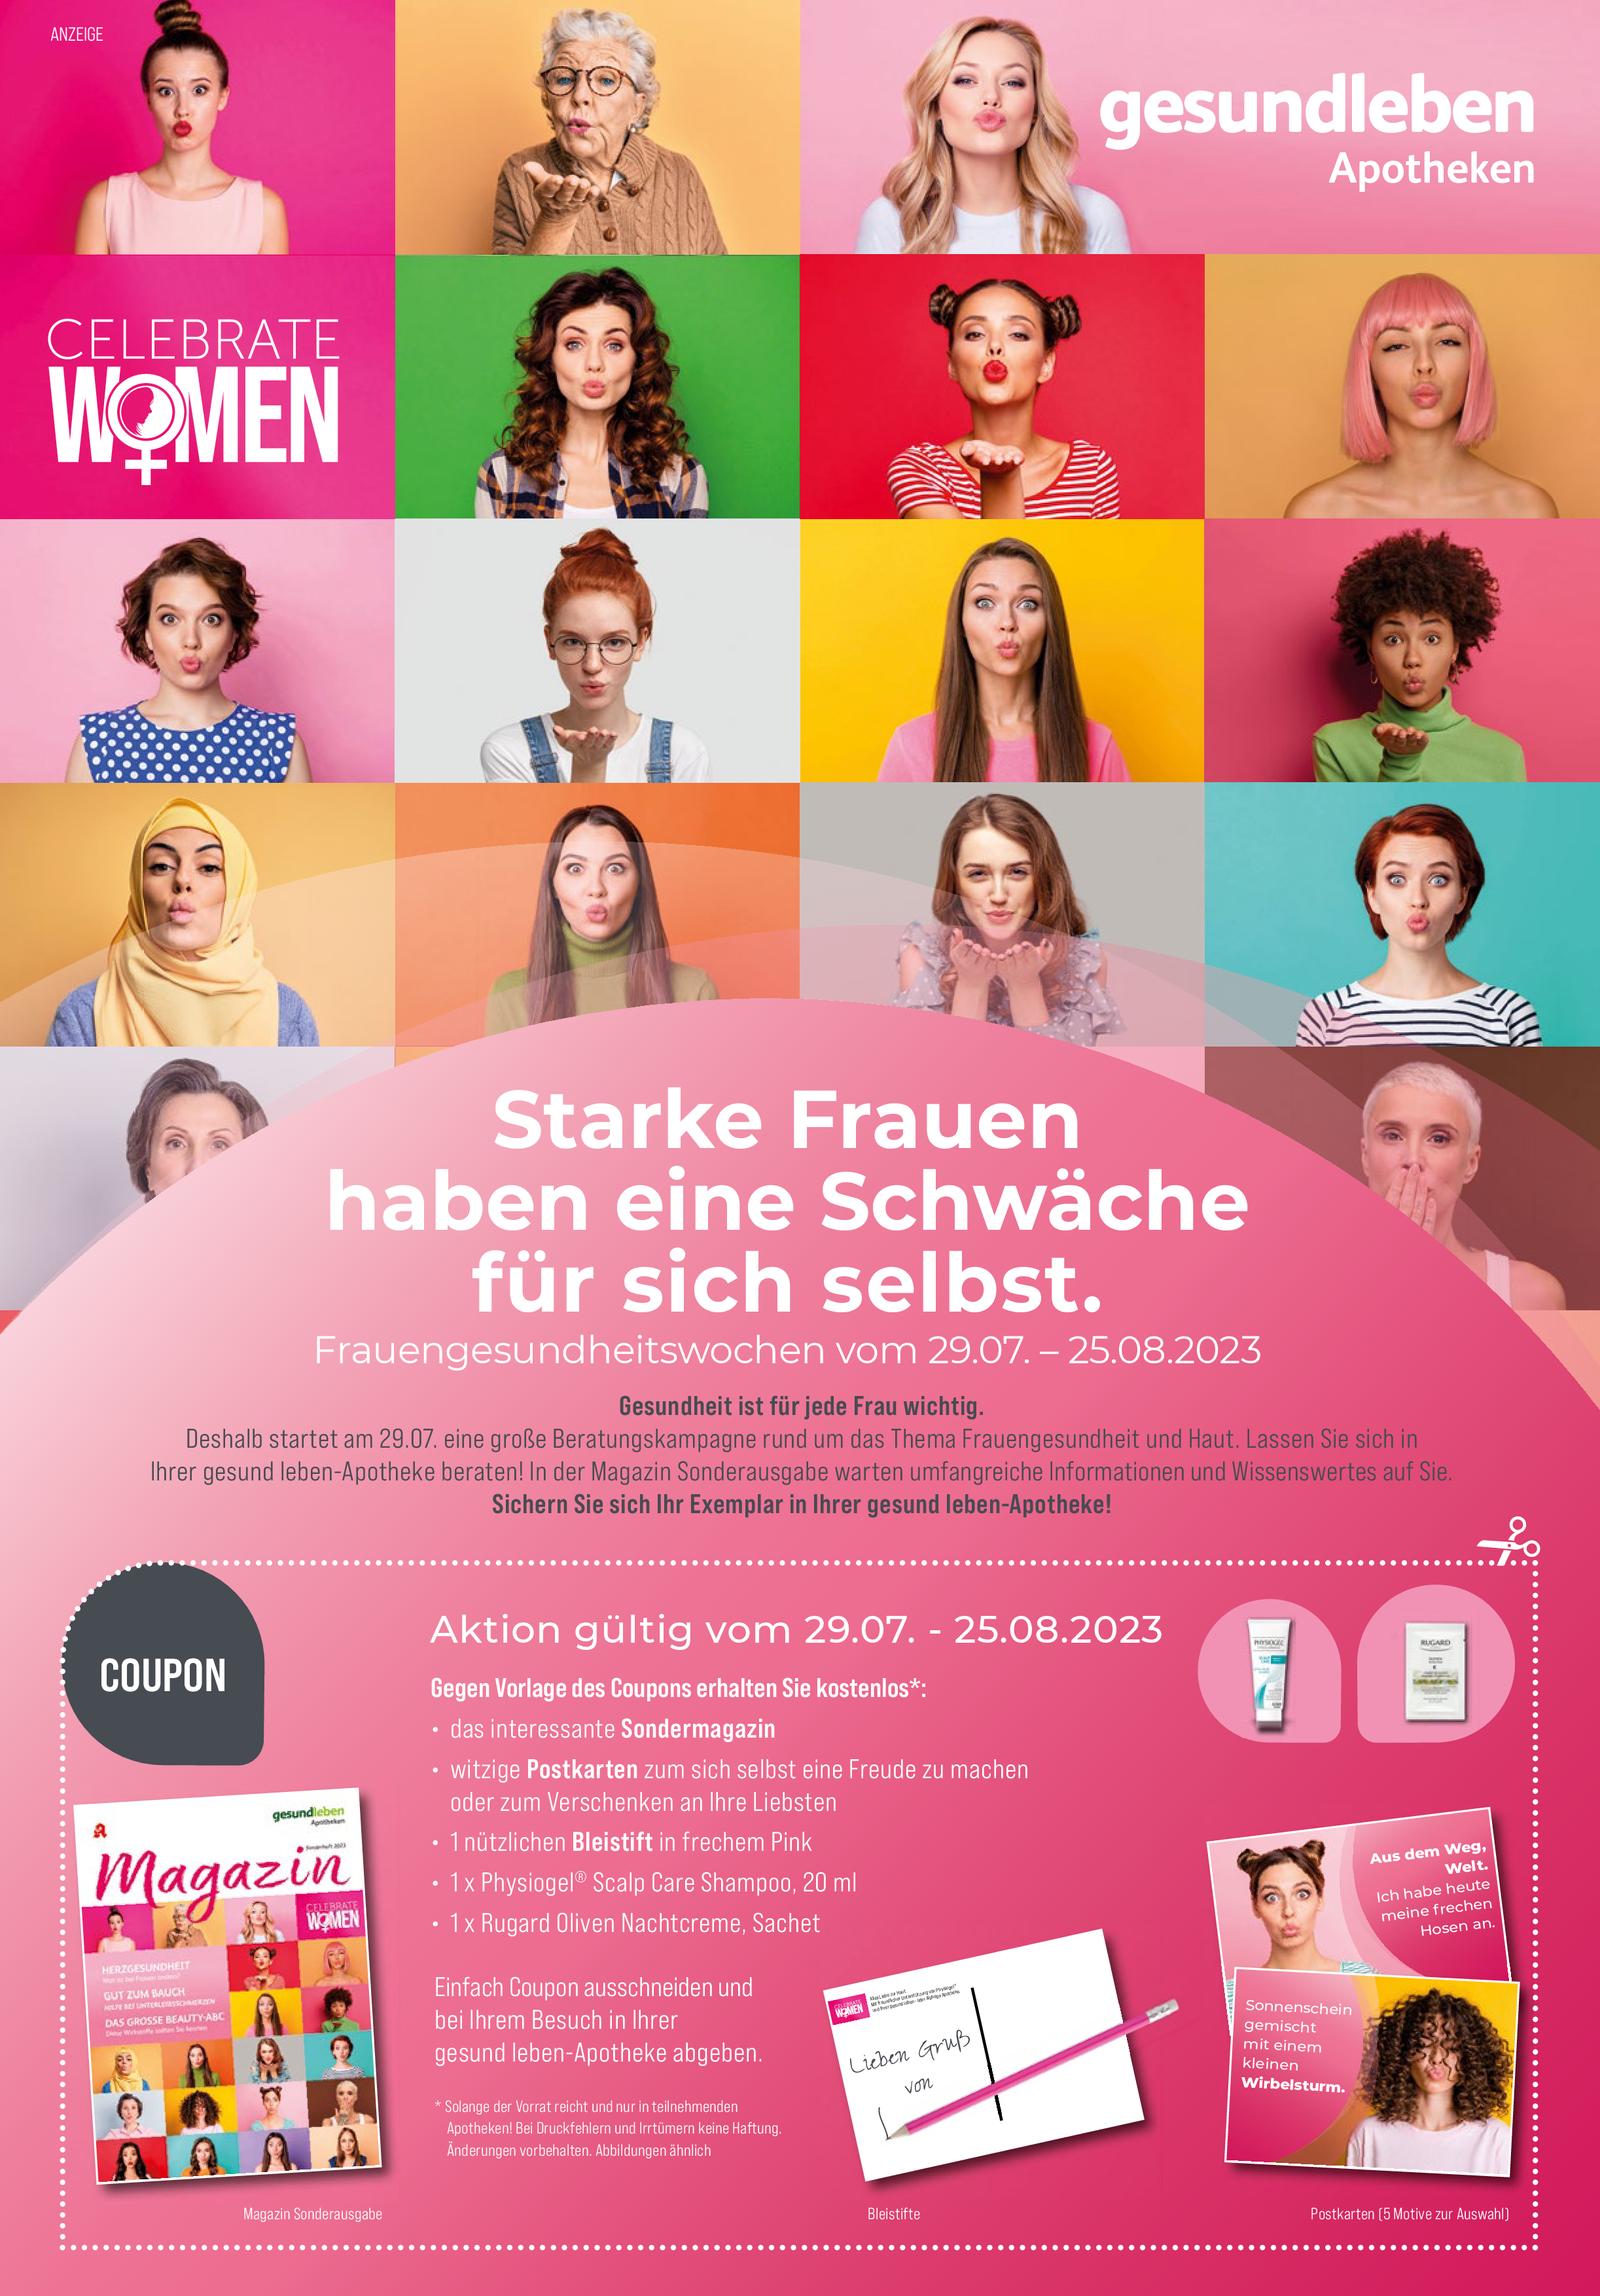 https://mein-uploads.apocdn.net/14114/leaflets/gesundleben_niedrig-Seite5.png